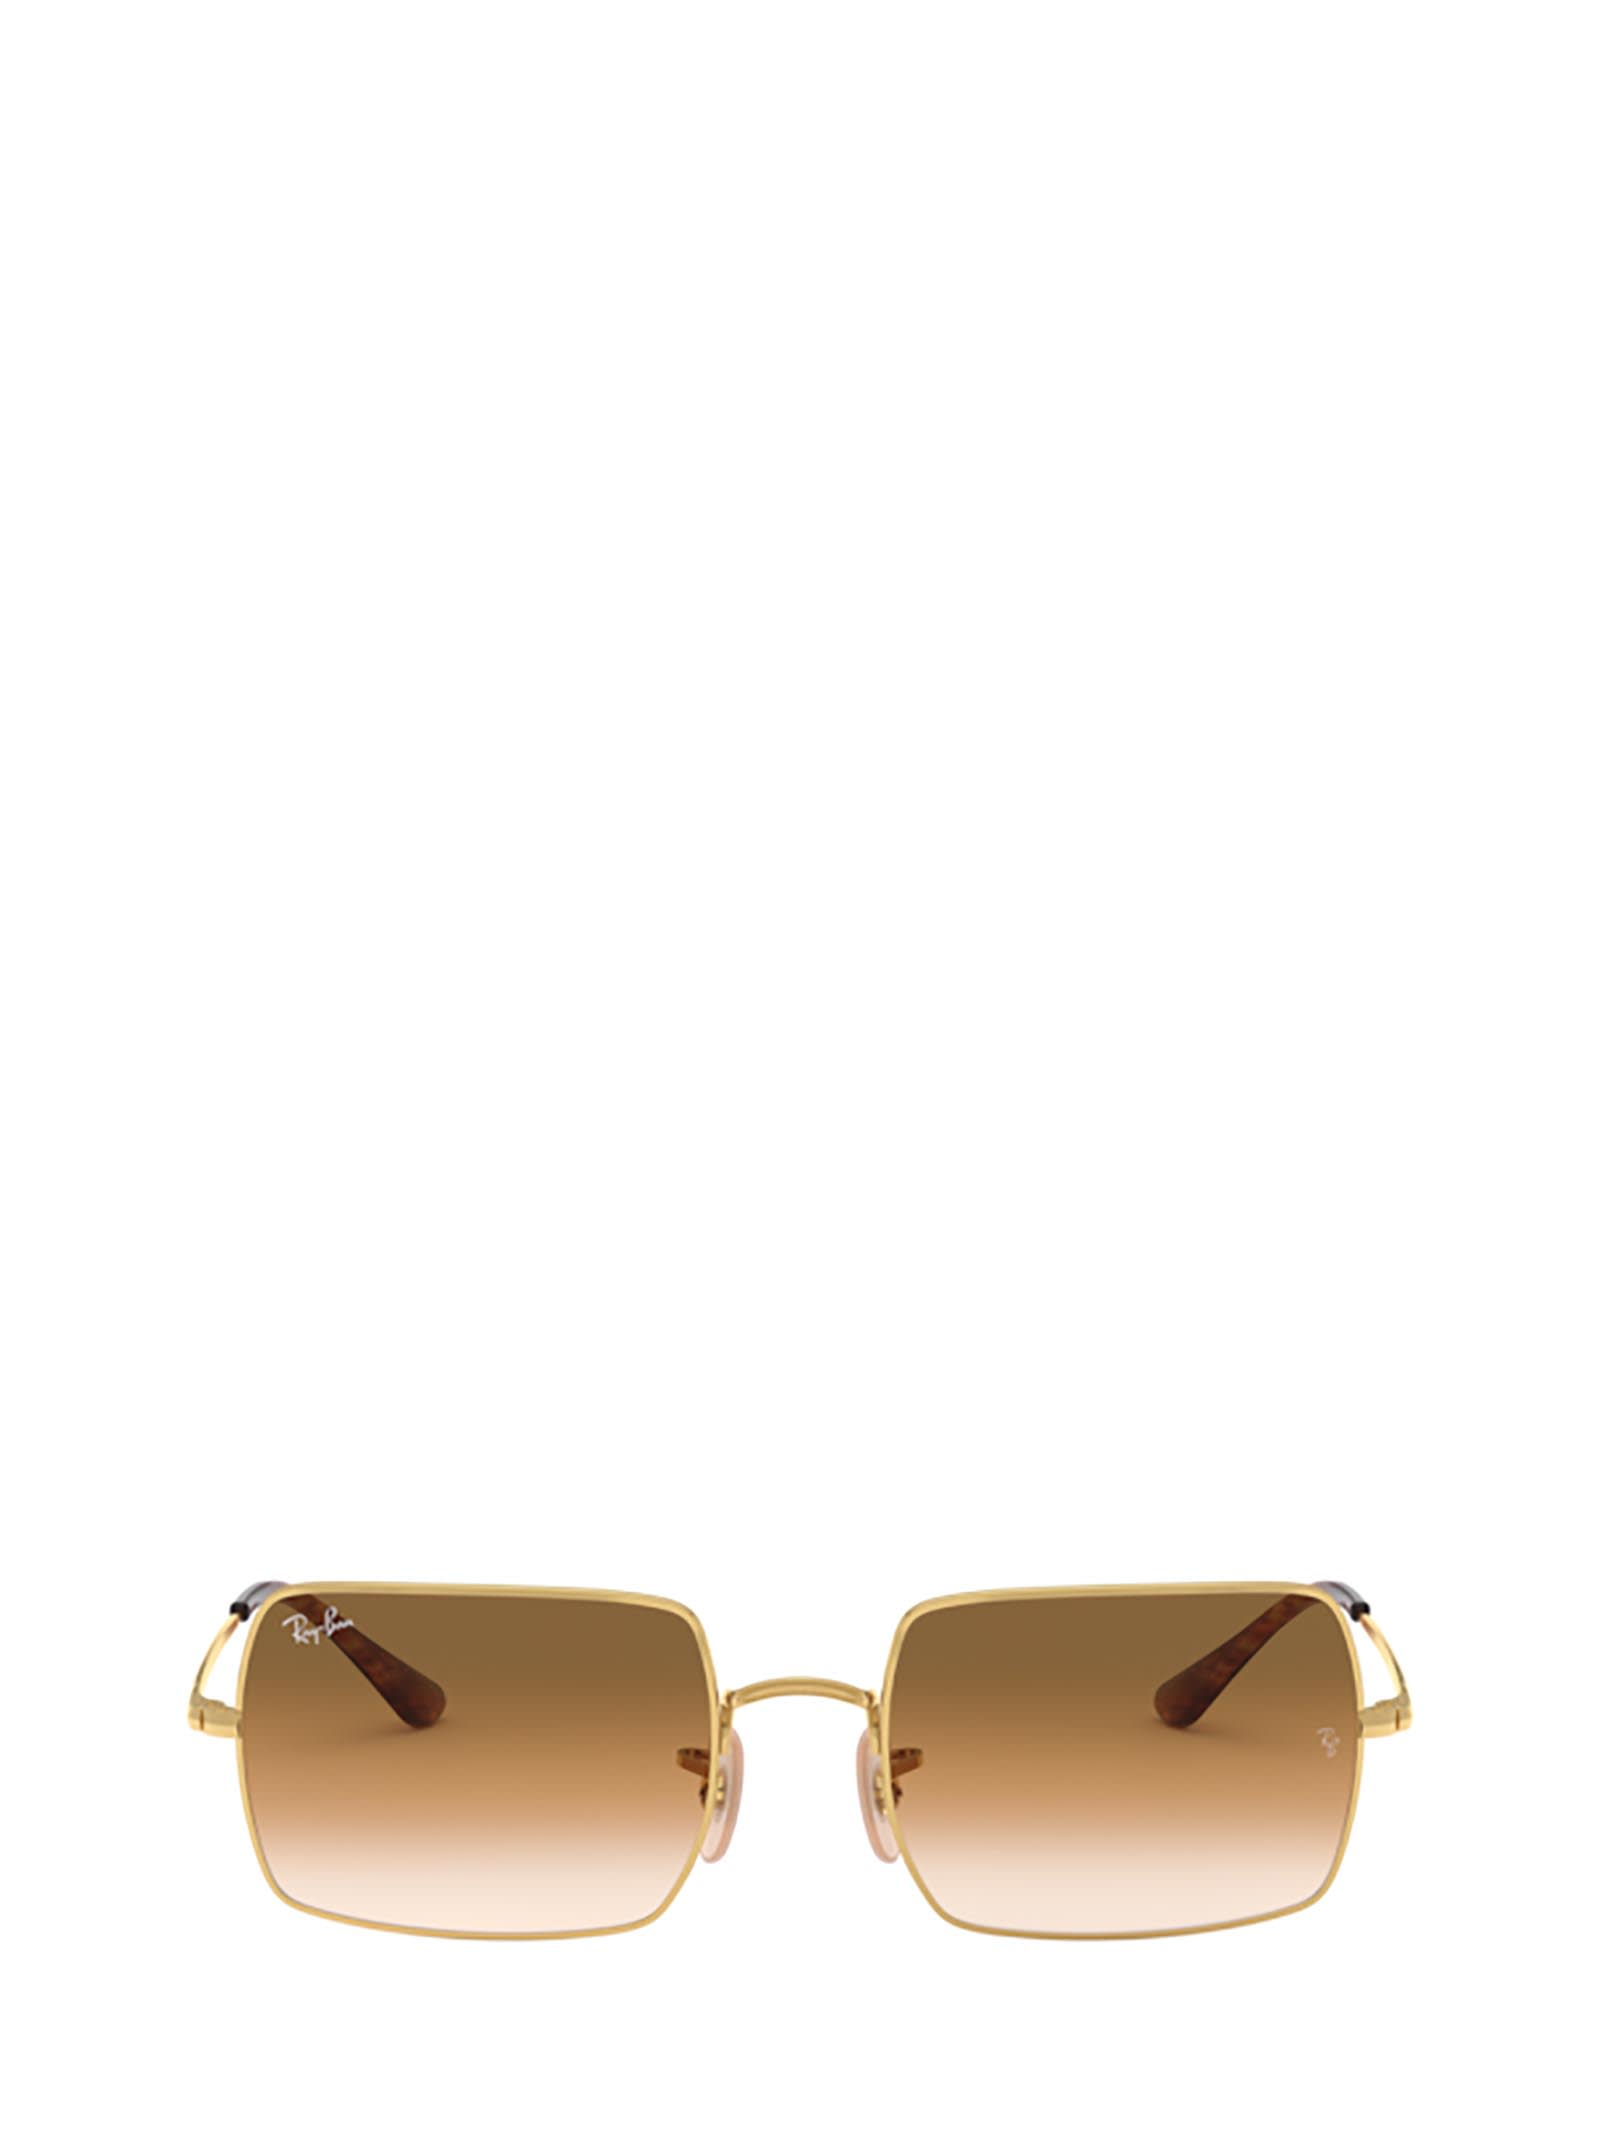 Ray Ban Ray-ban Rb1969 Arista Sunglasses